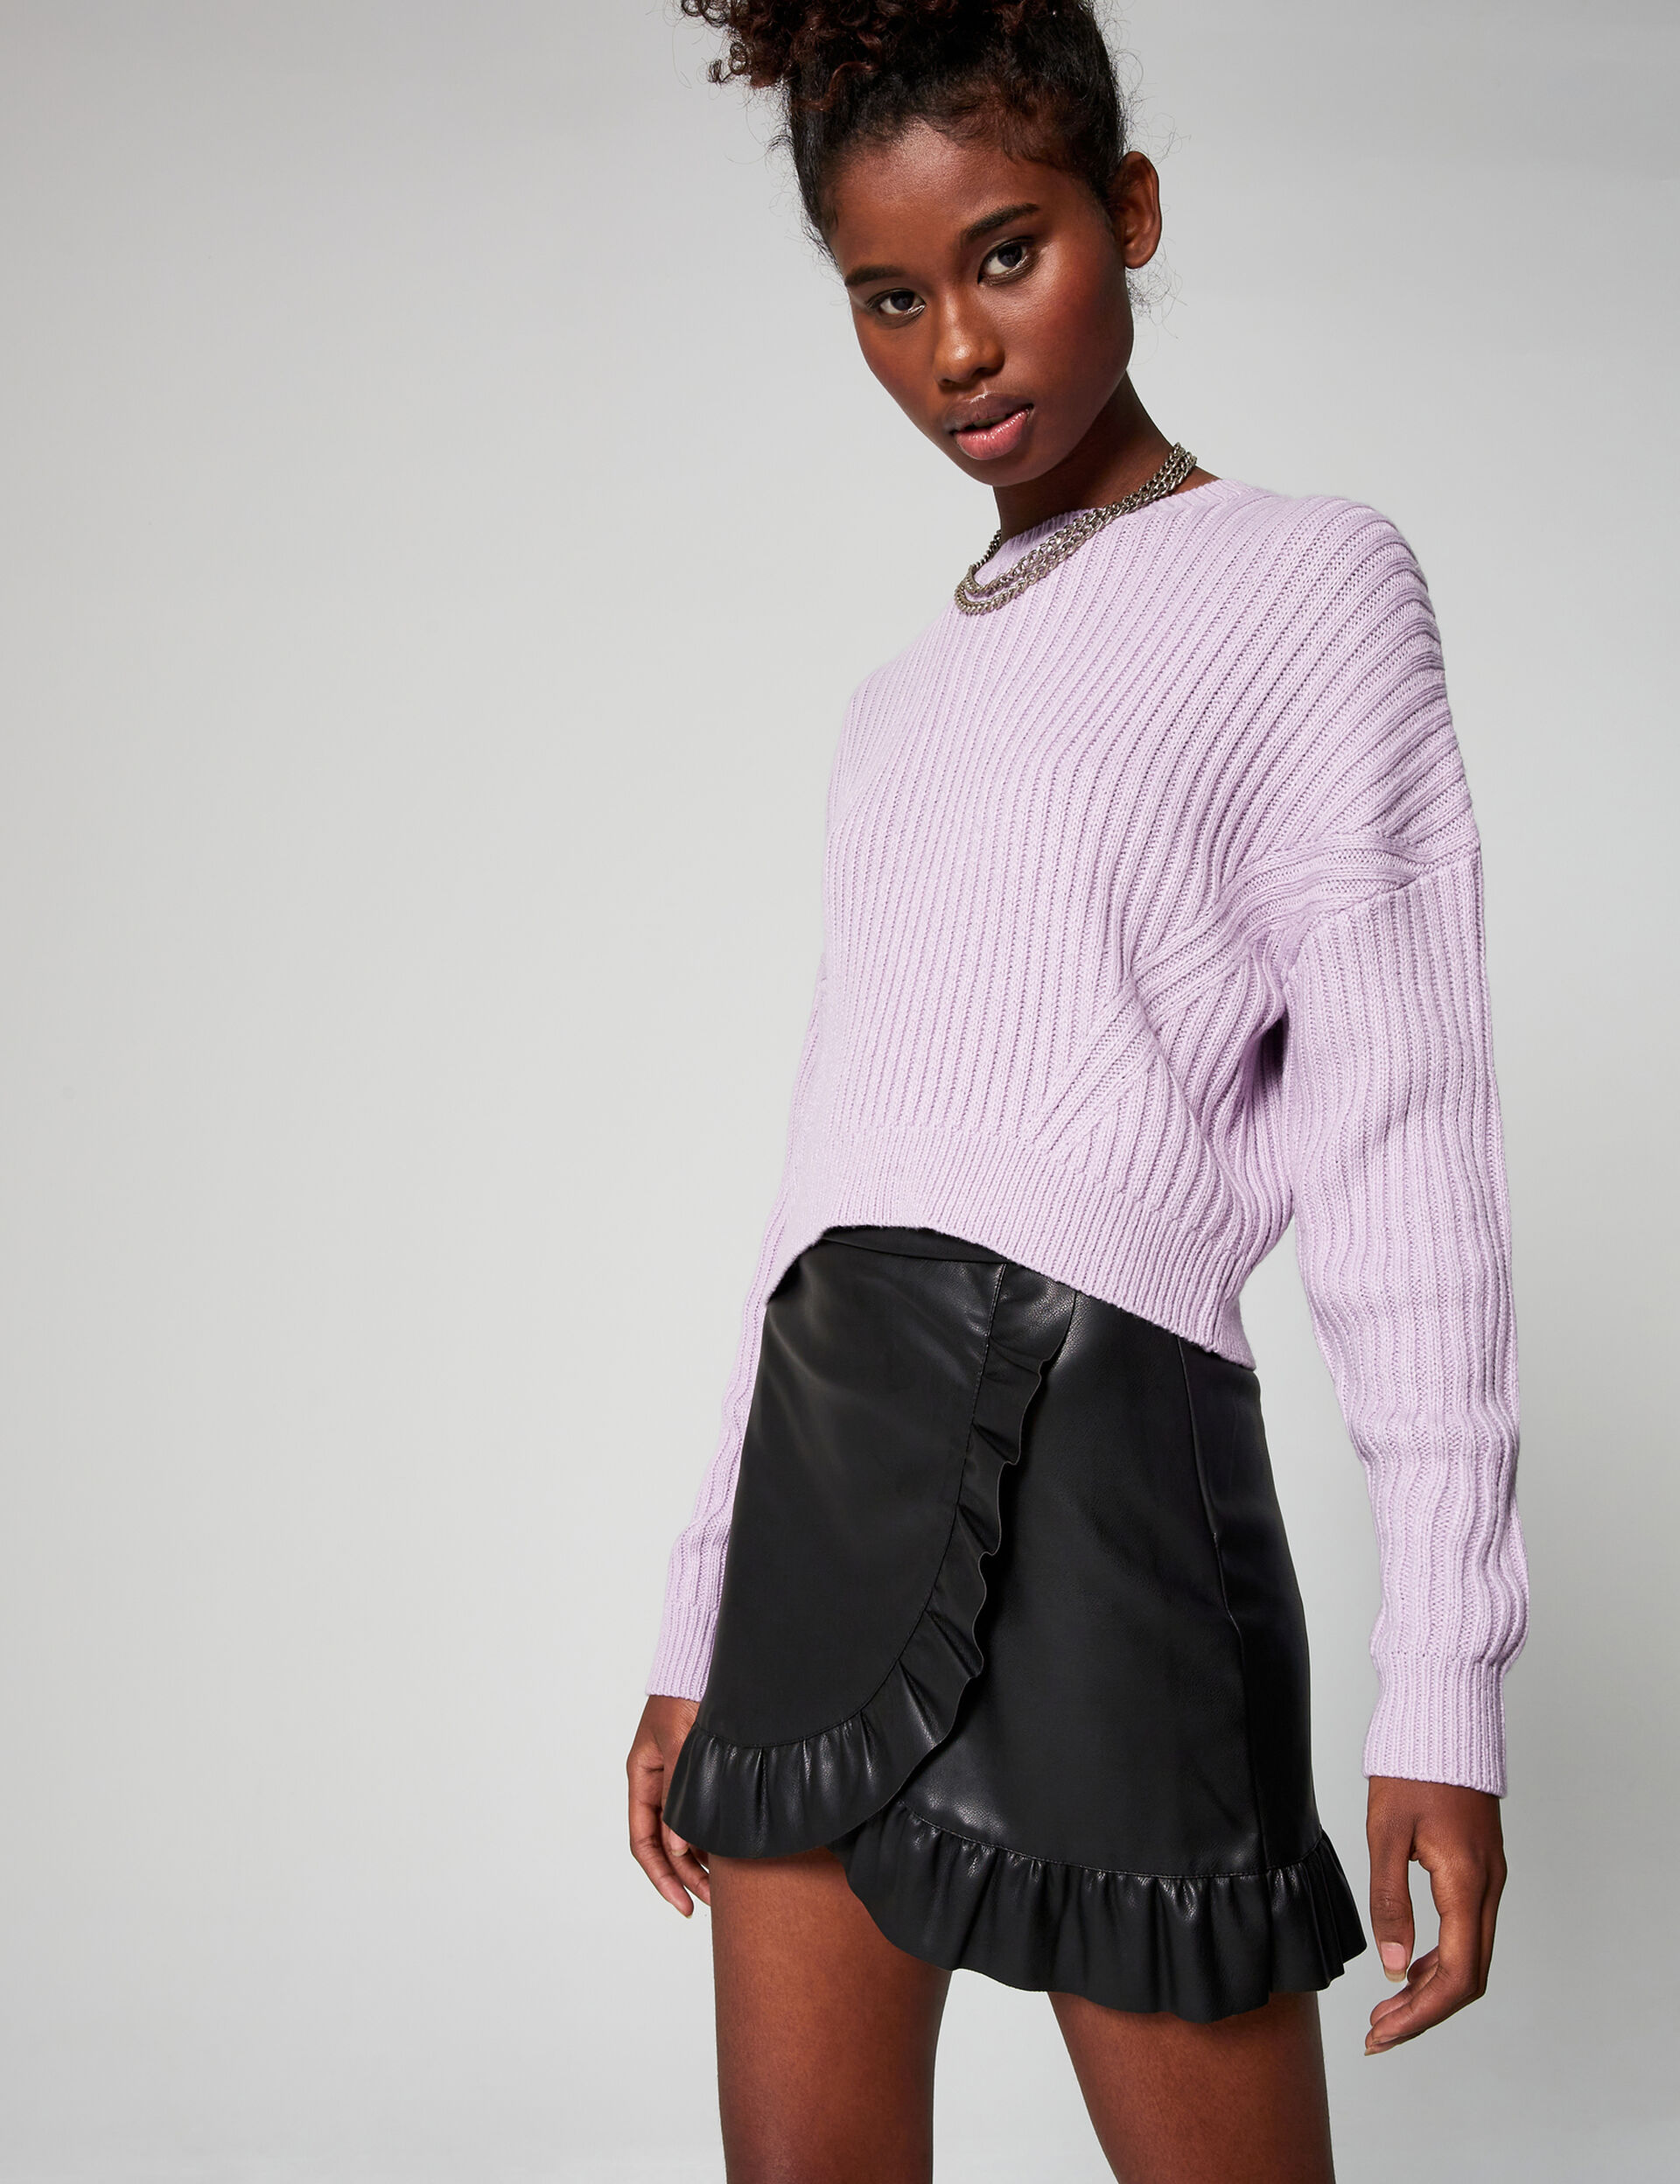 Imitation-leather skirt with flounced hem